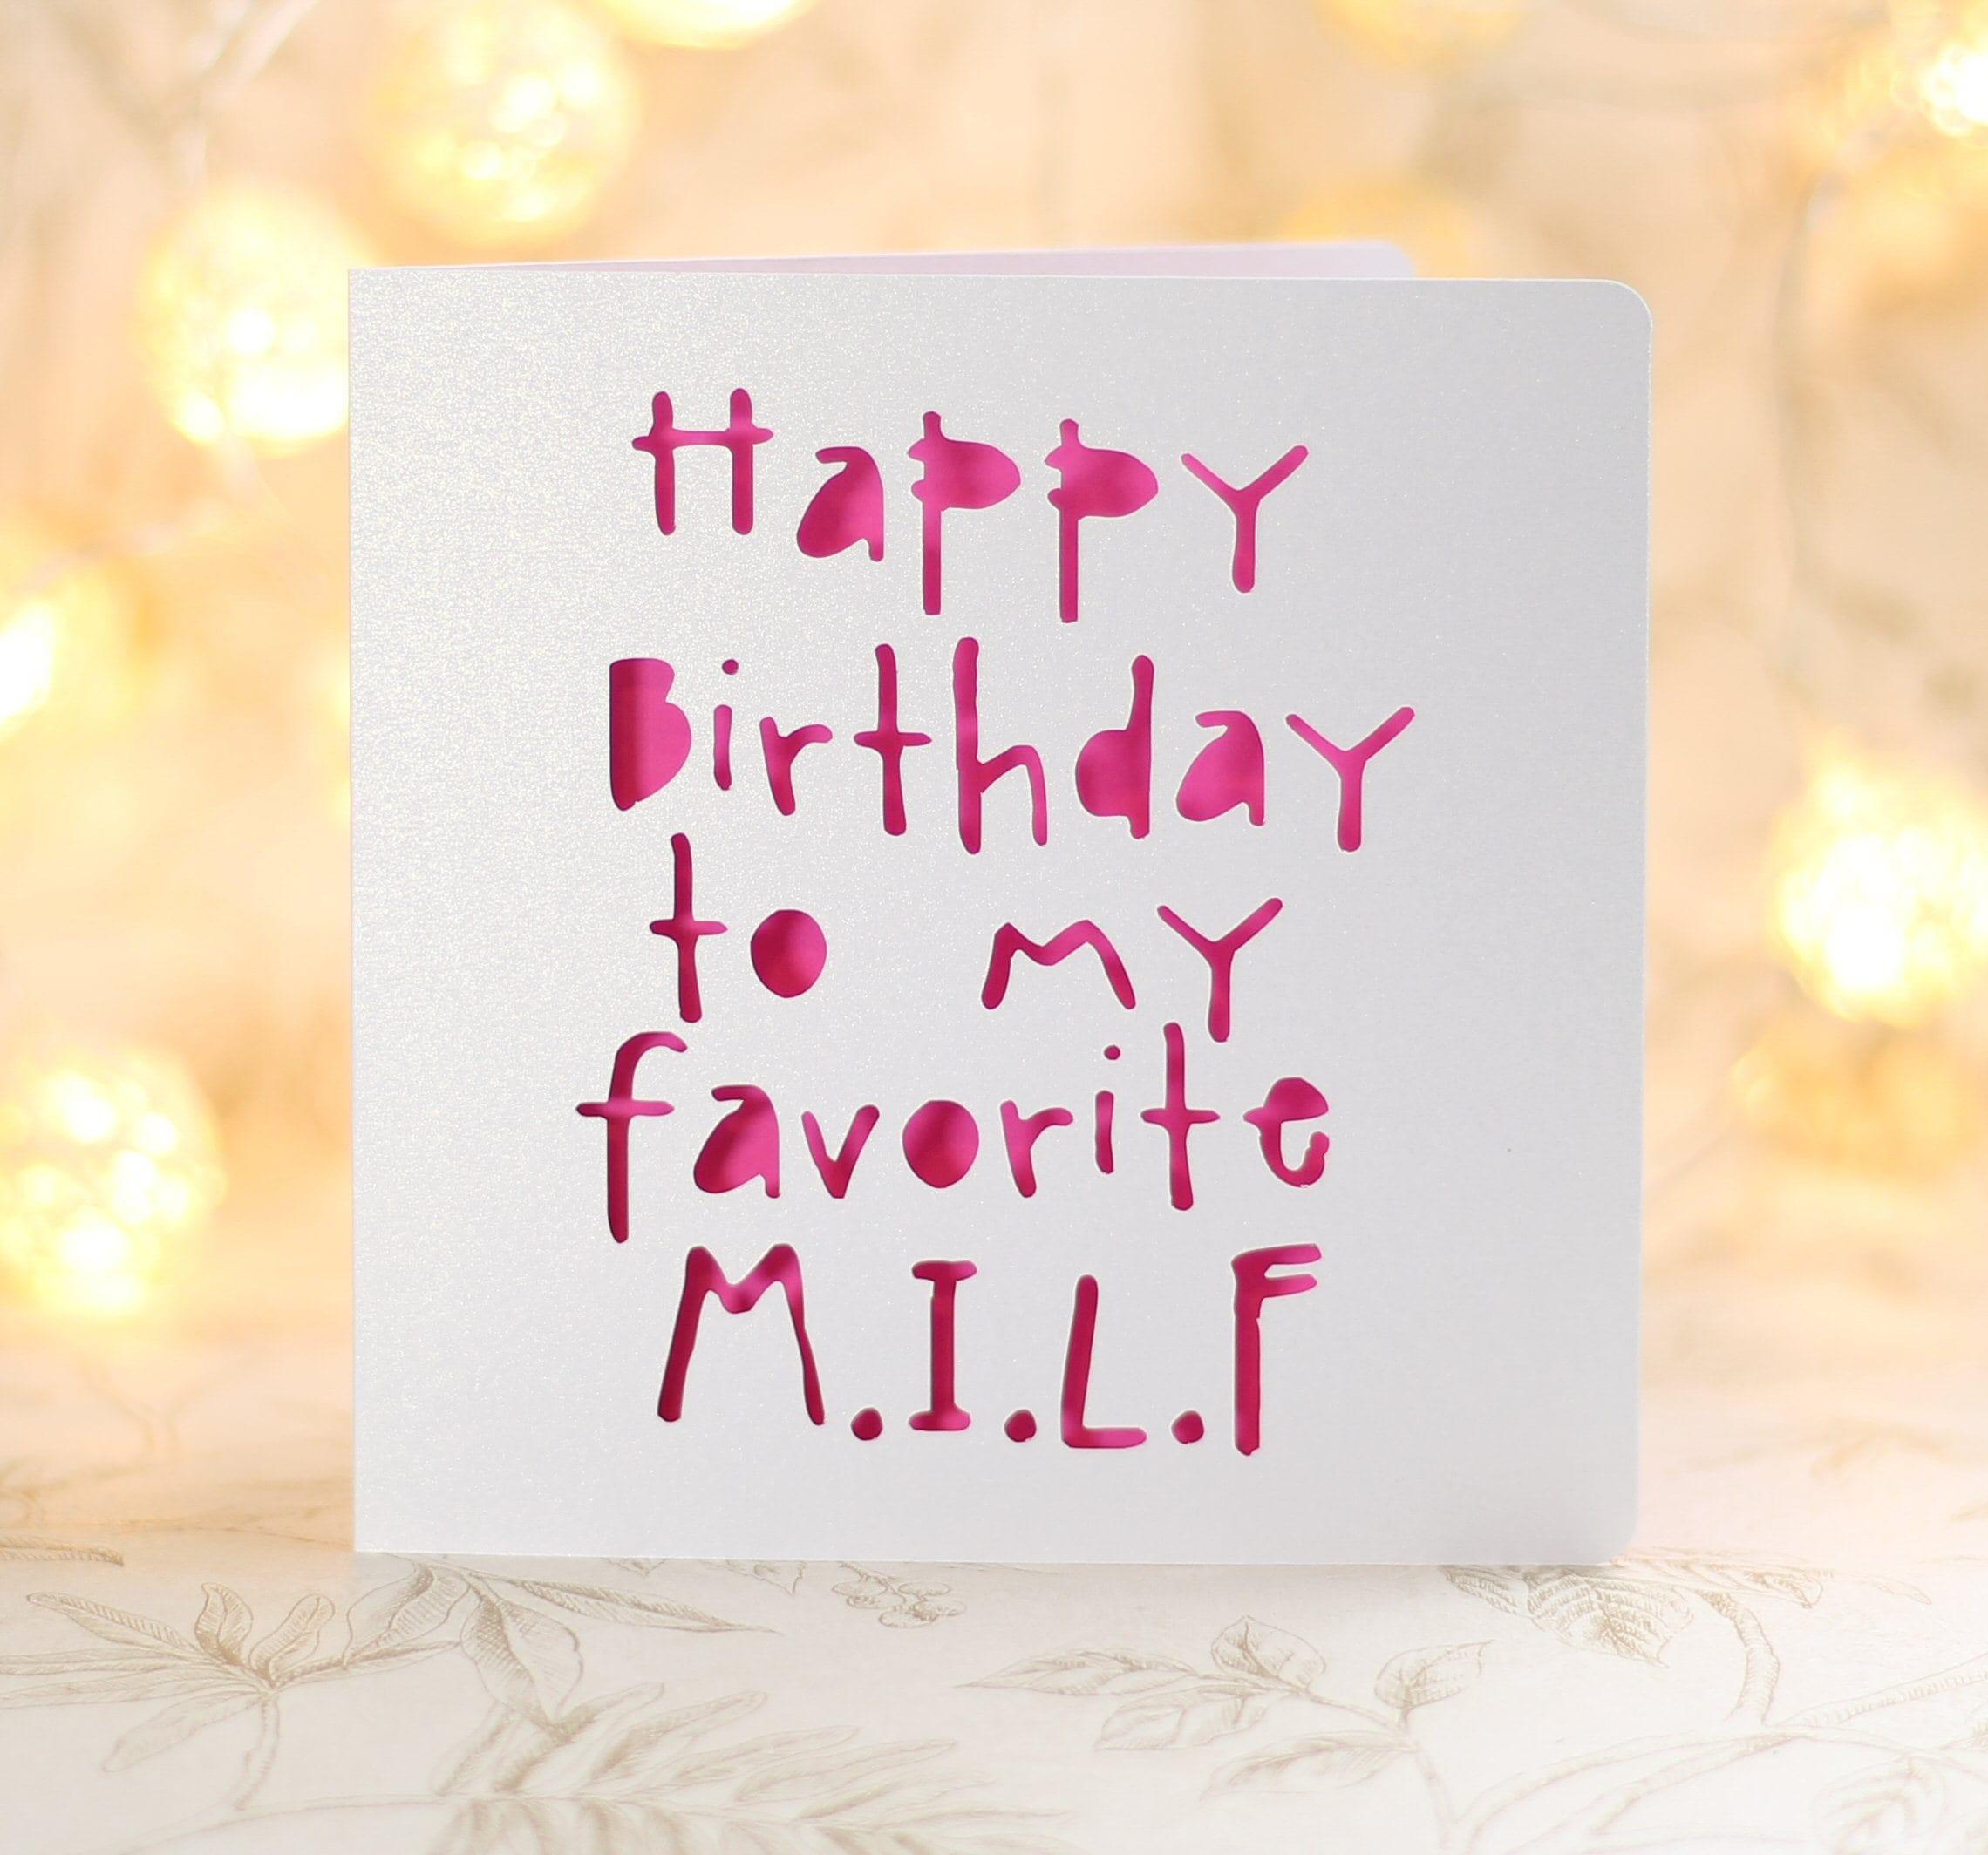 Happy birthday fuck face mature birthday card Funny Card